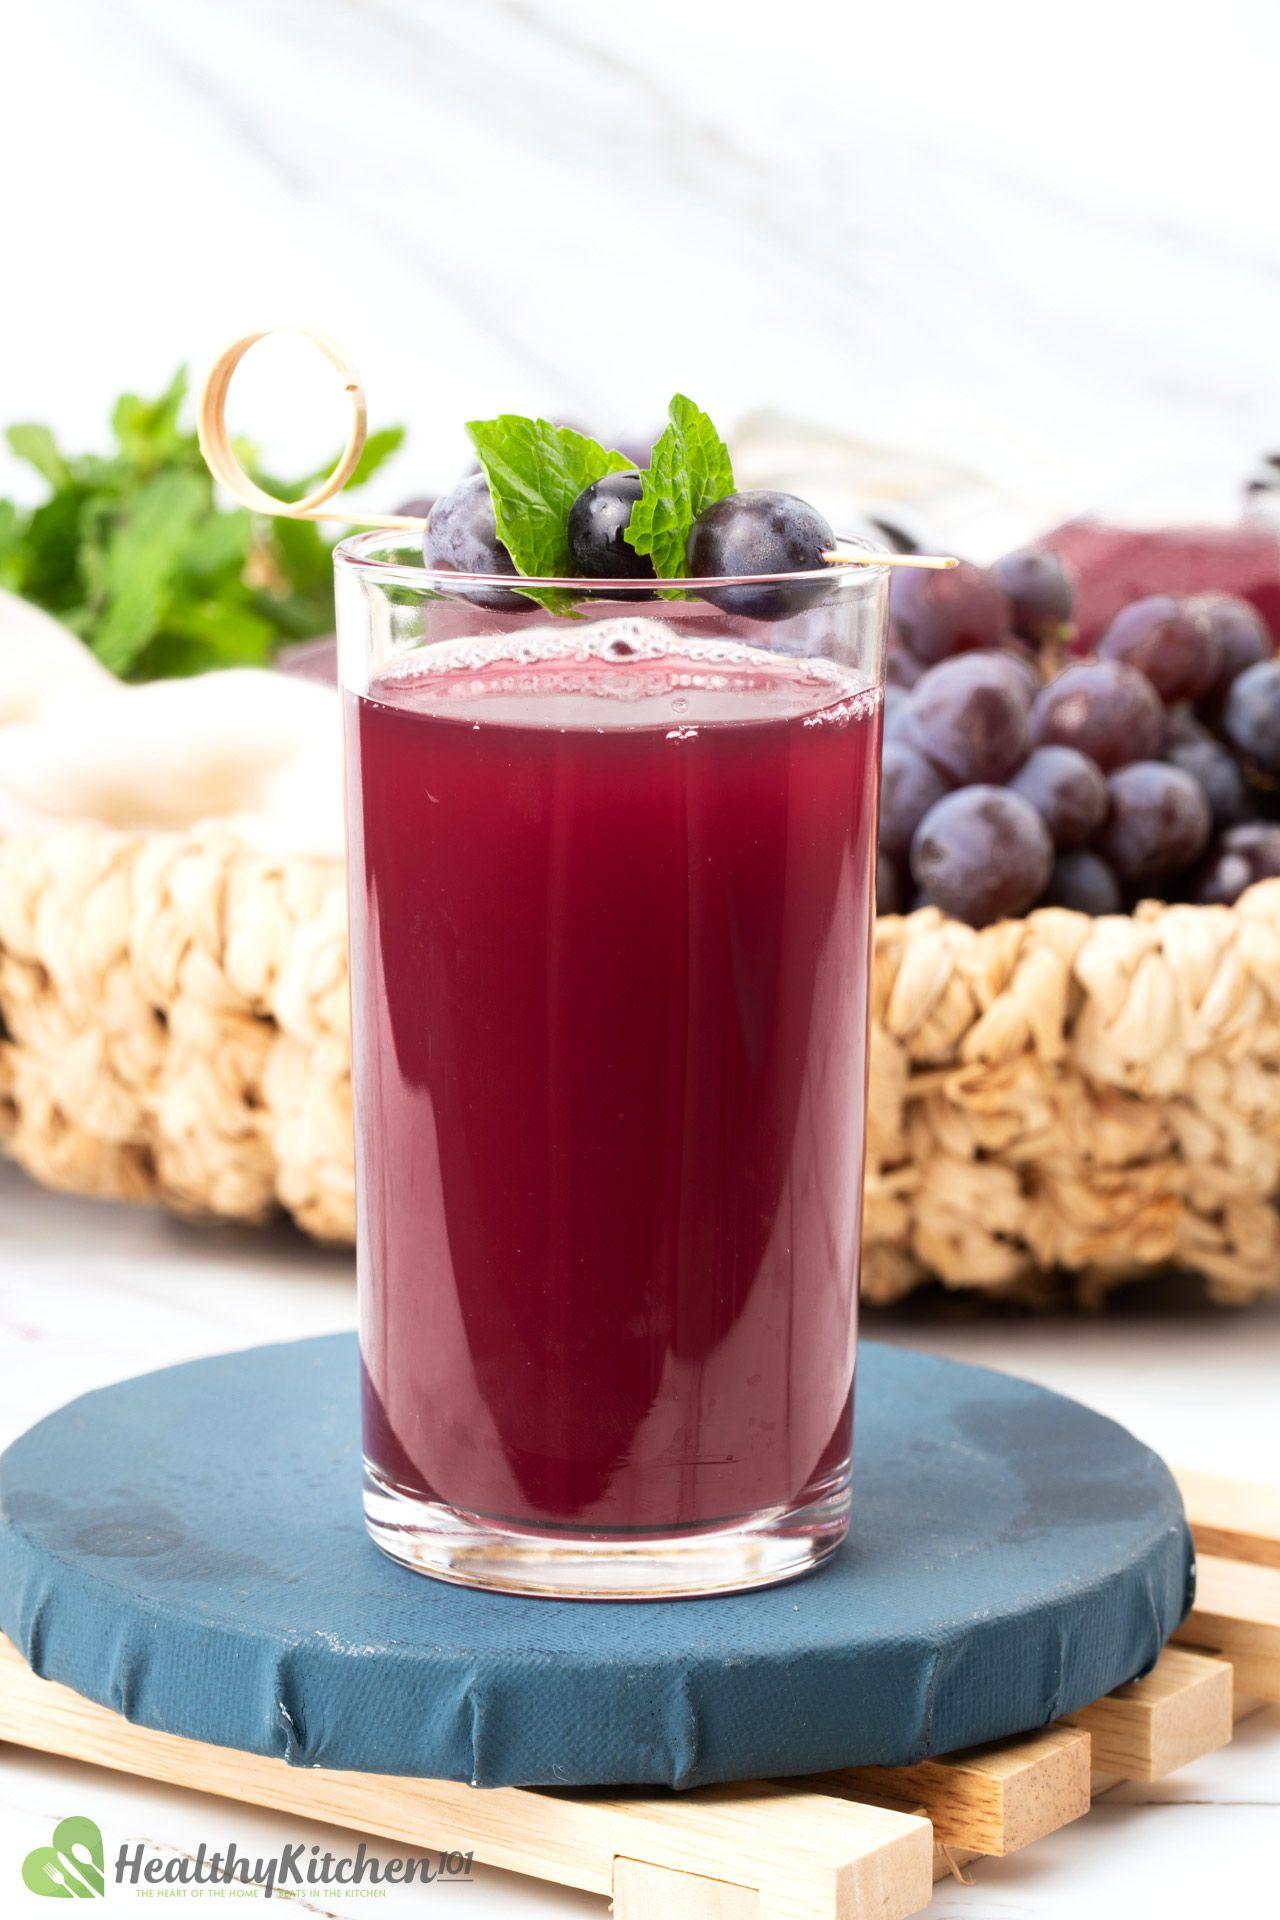 Homemade Apple Cider Vinegar and Grape Juice Recipe